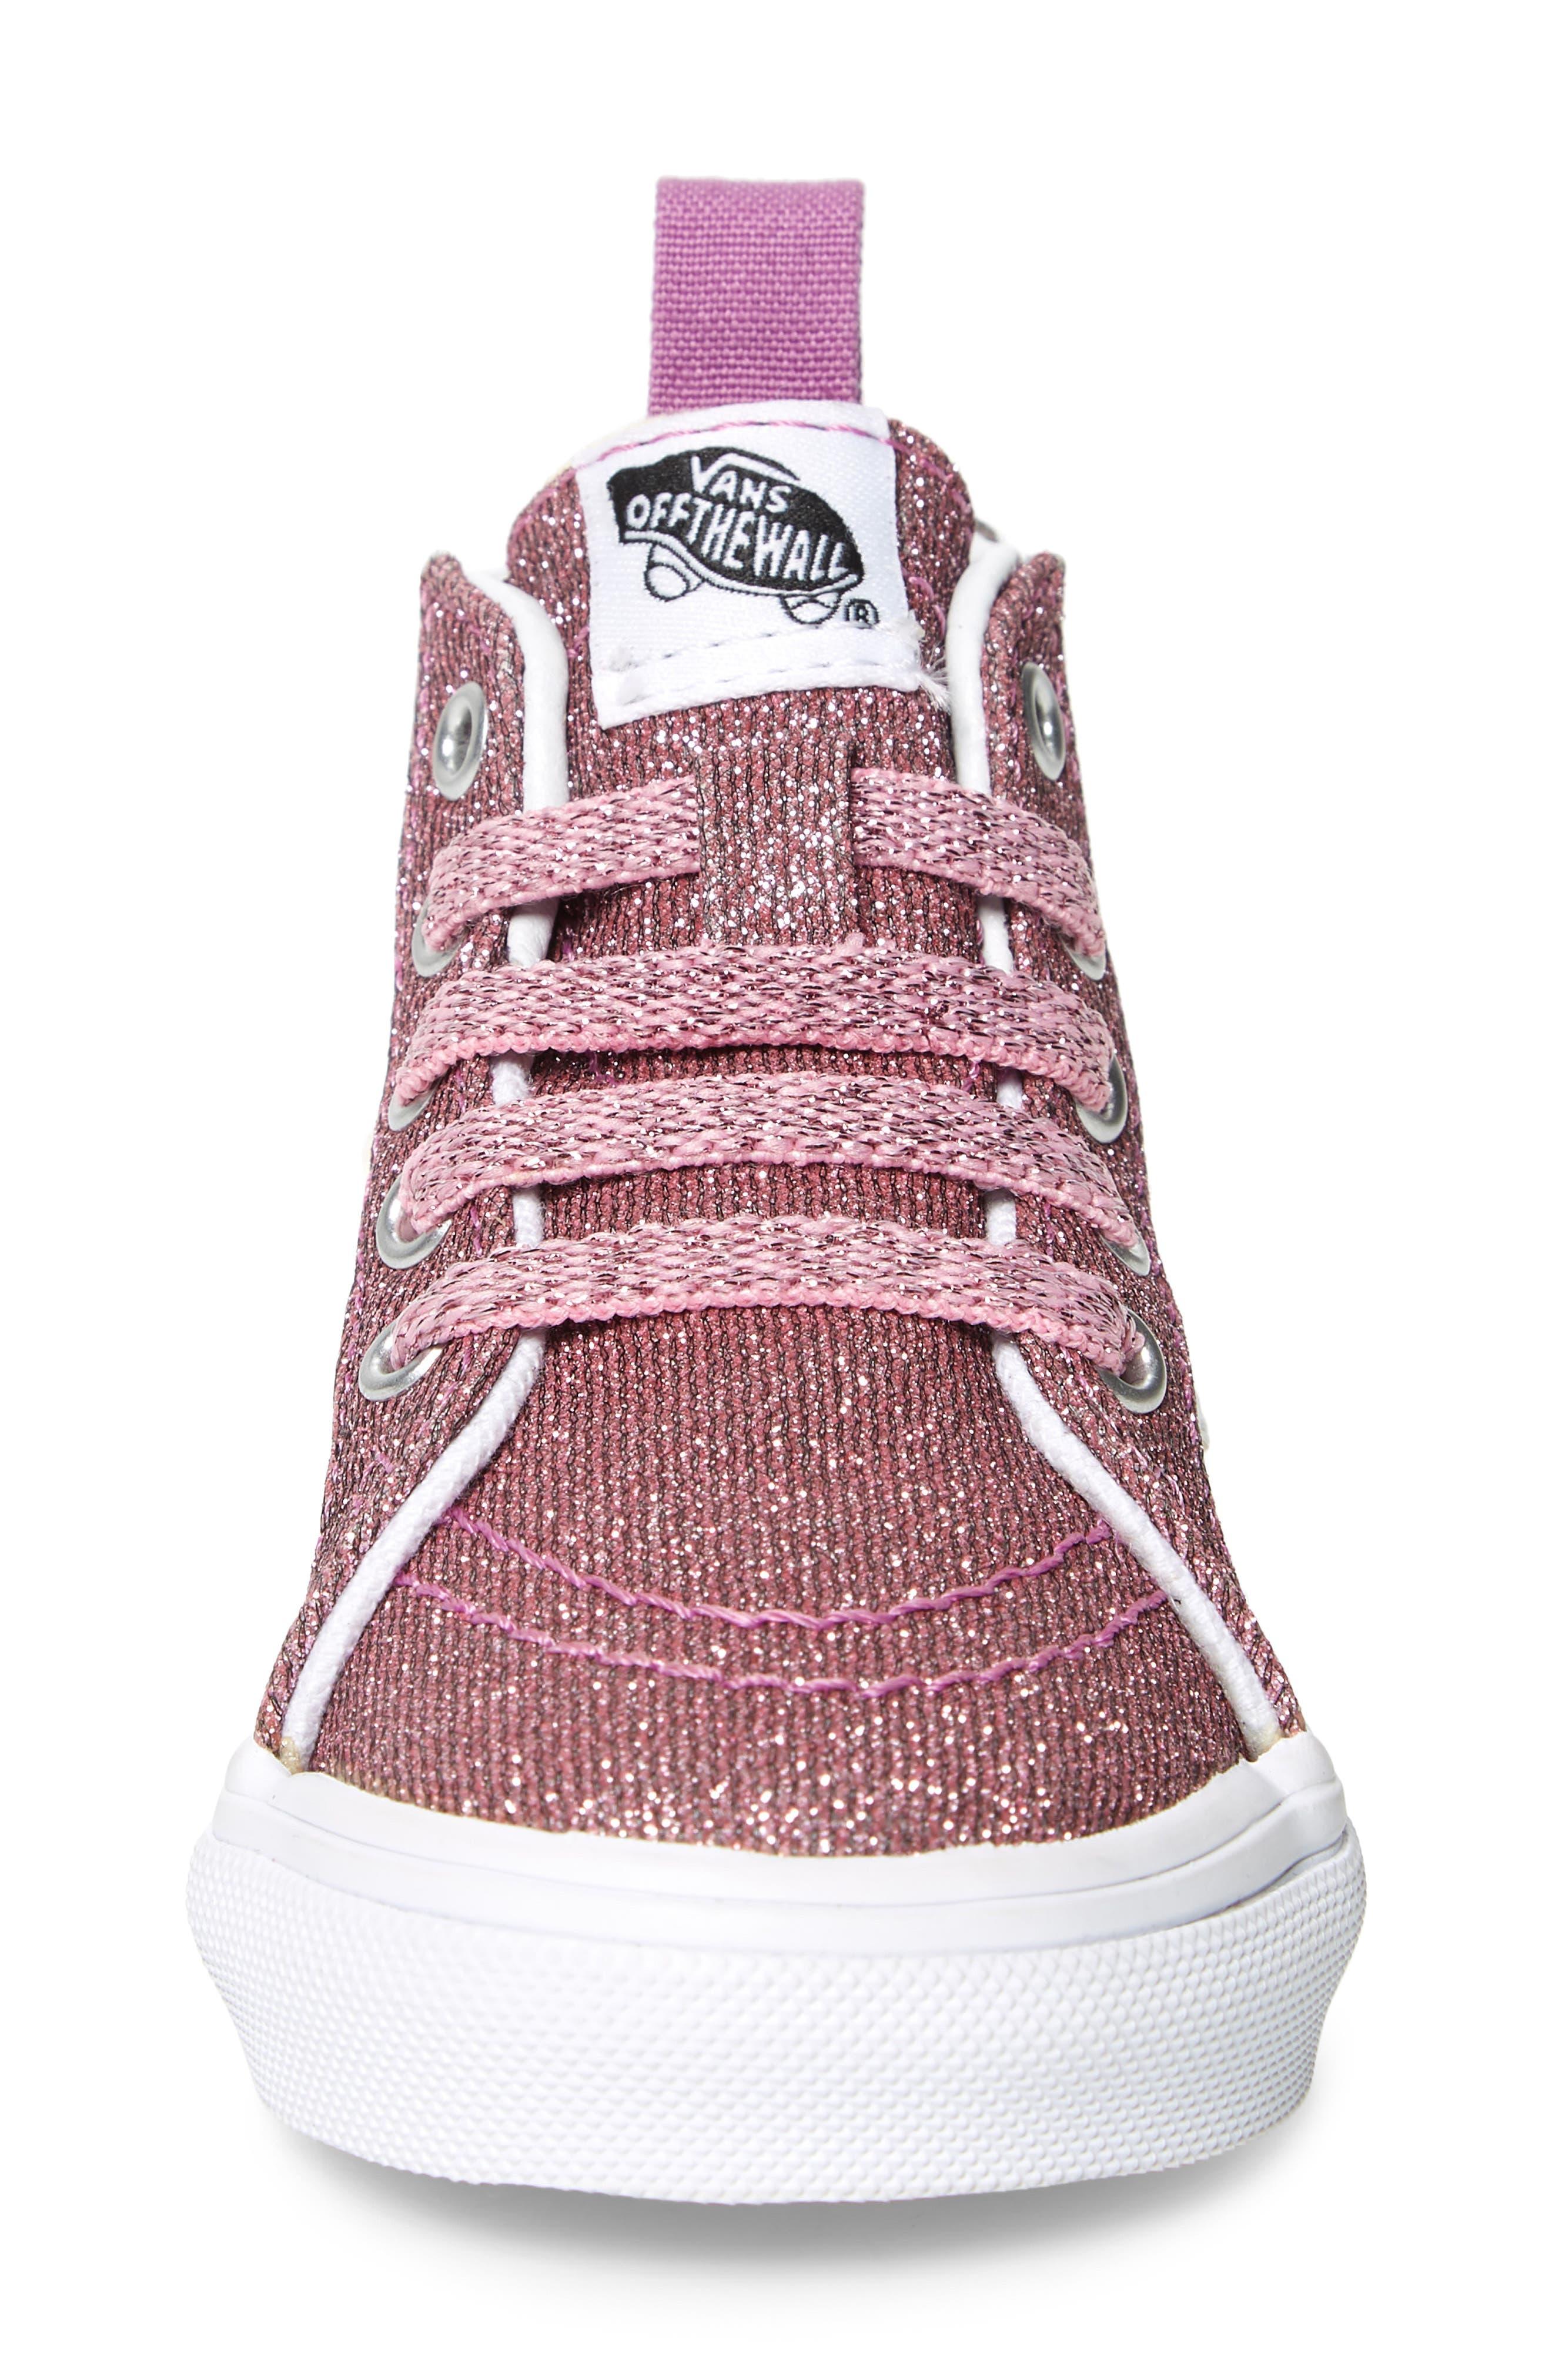 Sk8-Hi Zip Sneaker,                             Alternate thumbnail 5, color,                             Lurex Glitter Pink/ True White